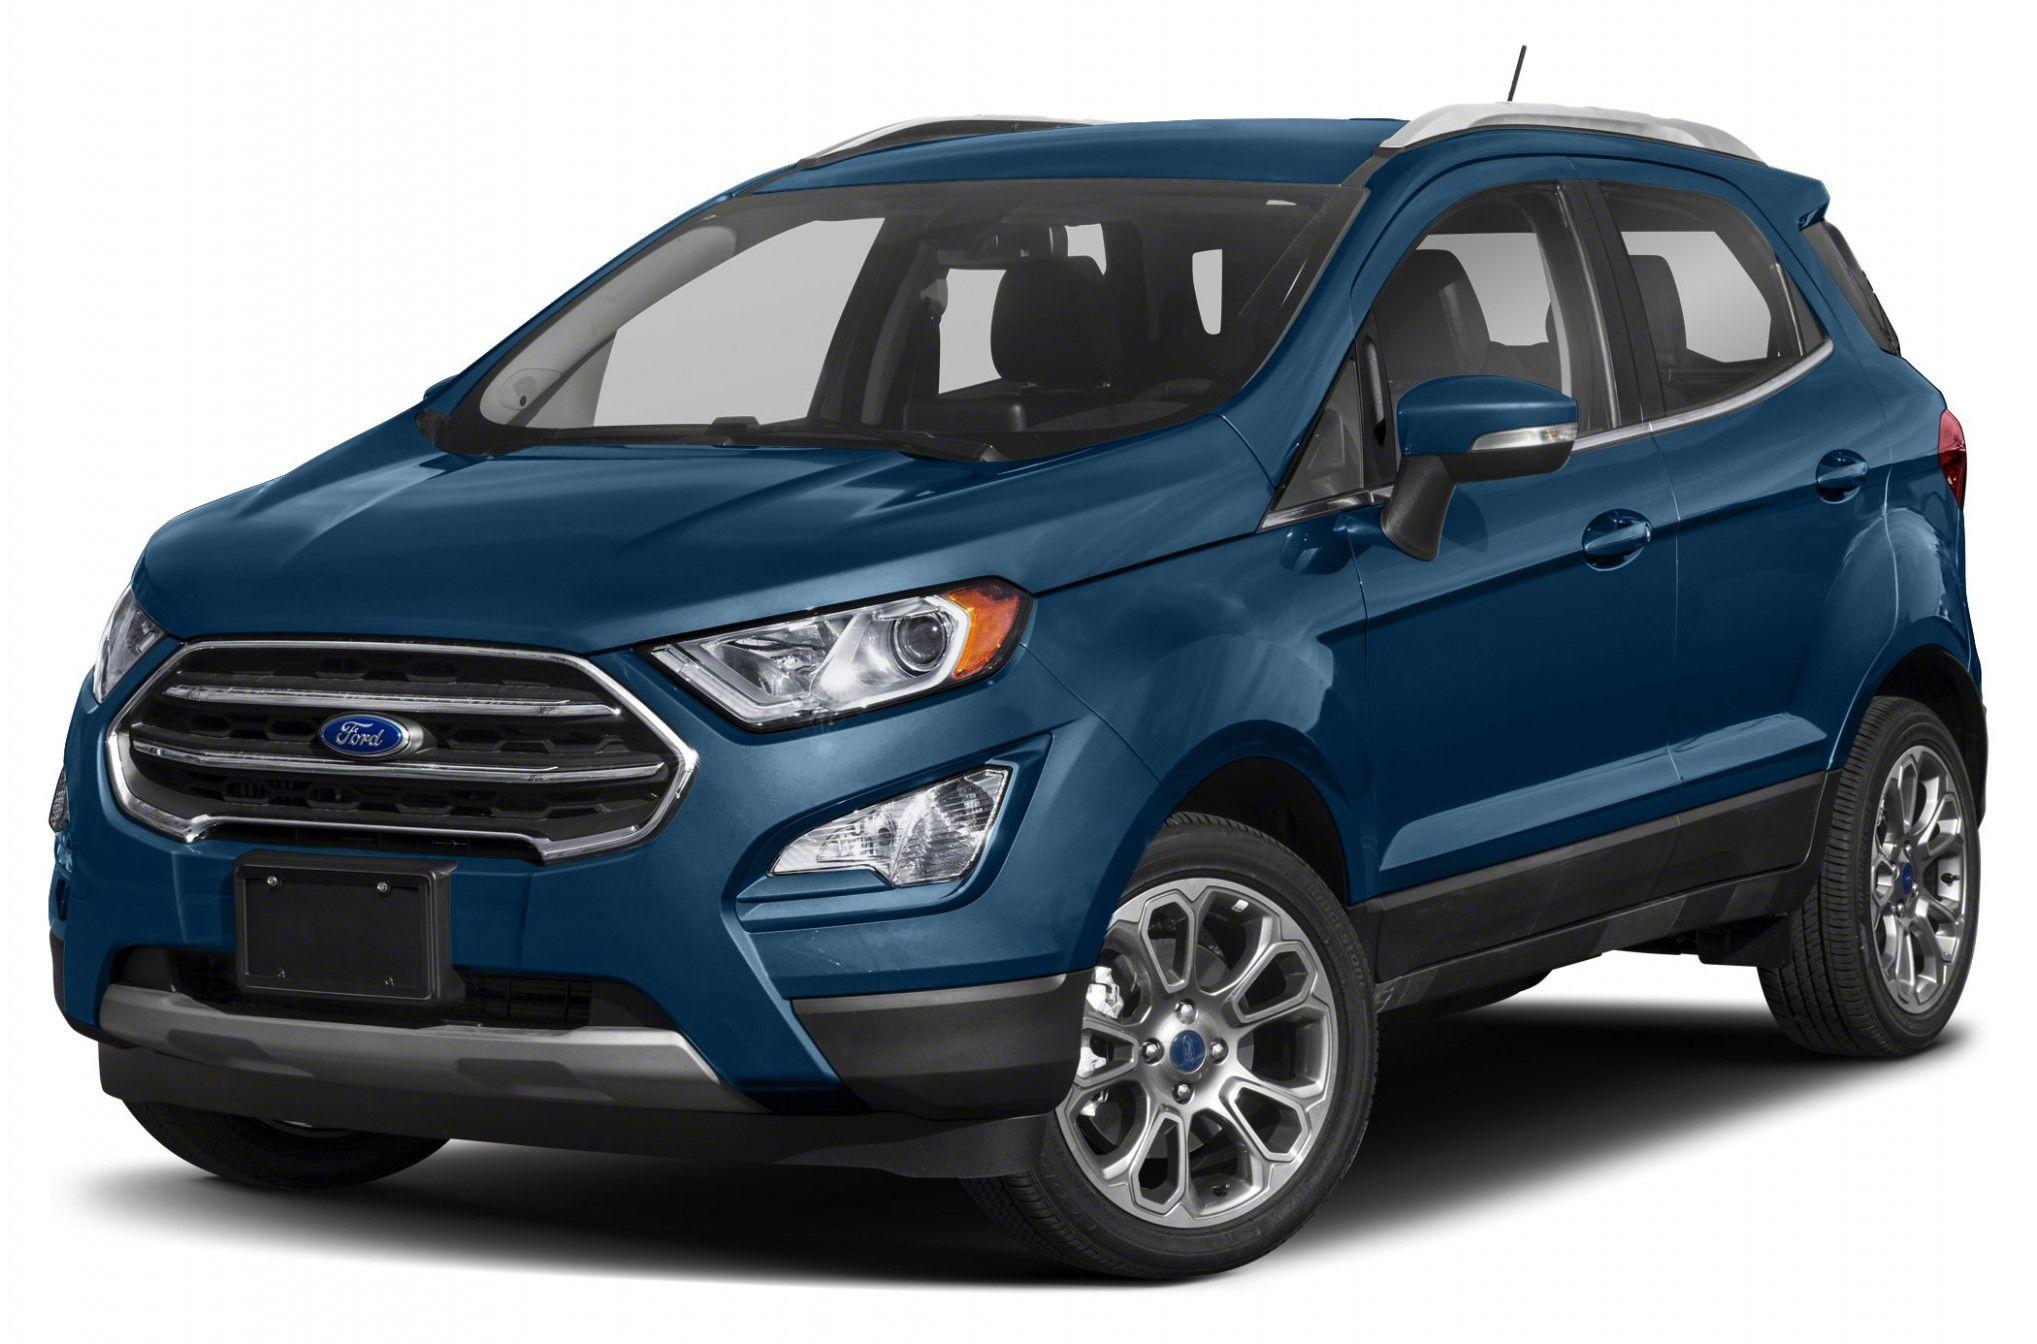 5 Ford Ecosport Information Autoblog Ford Ecosport 2020 Price